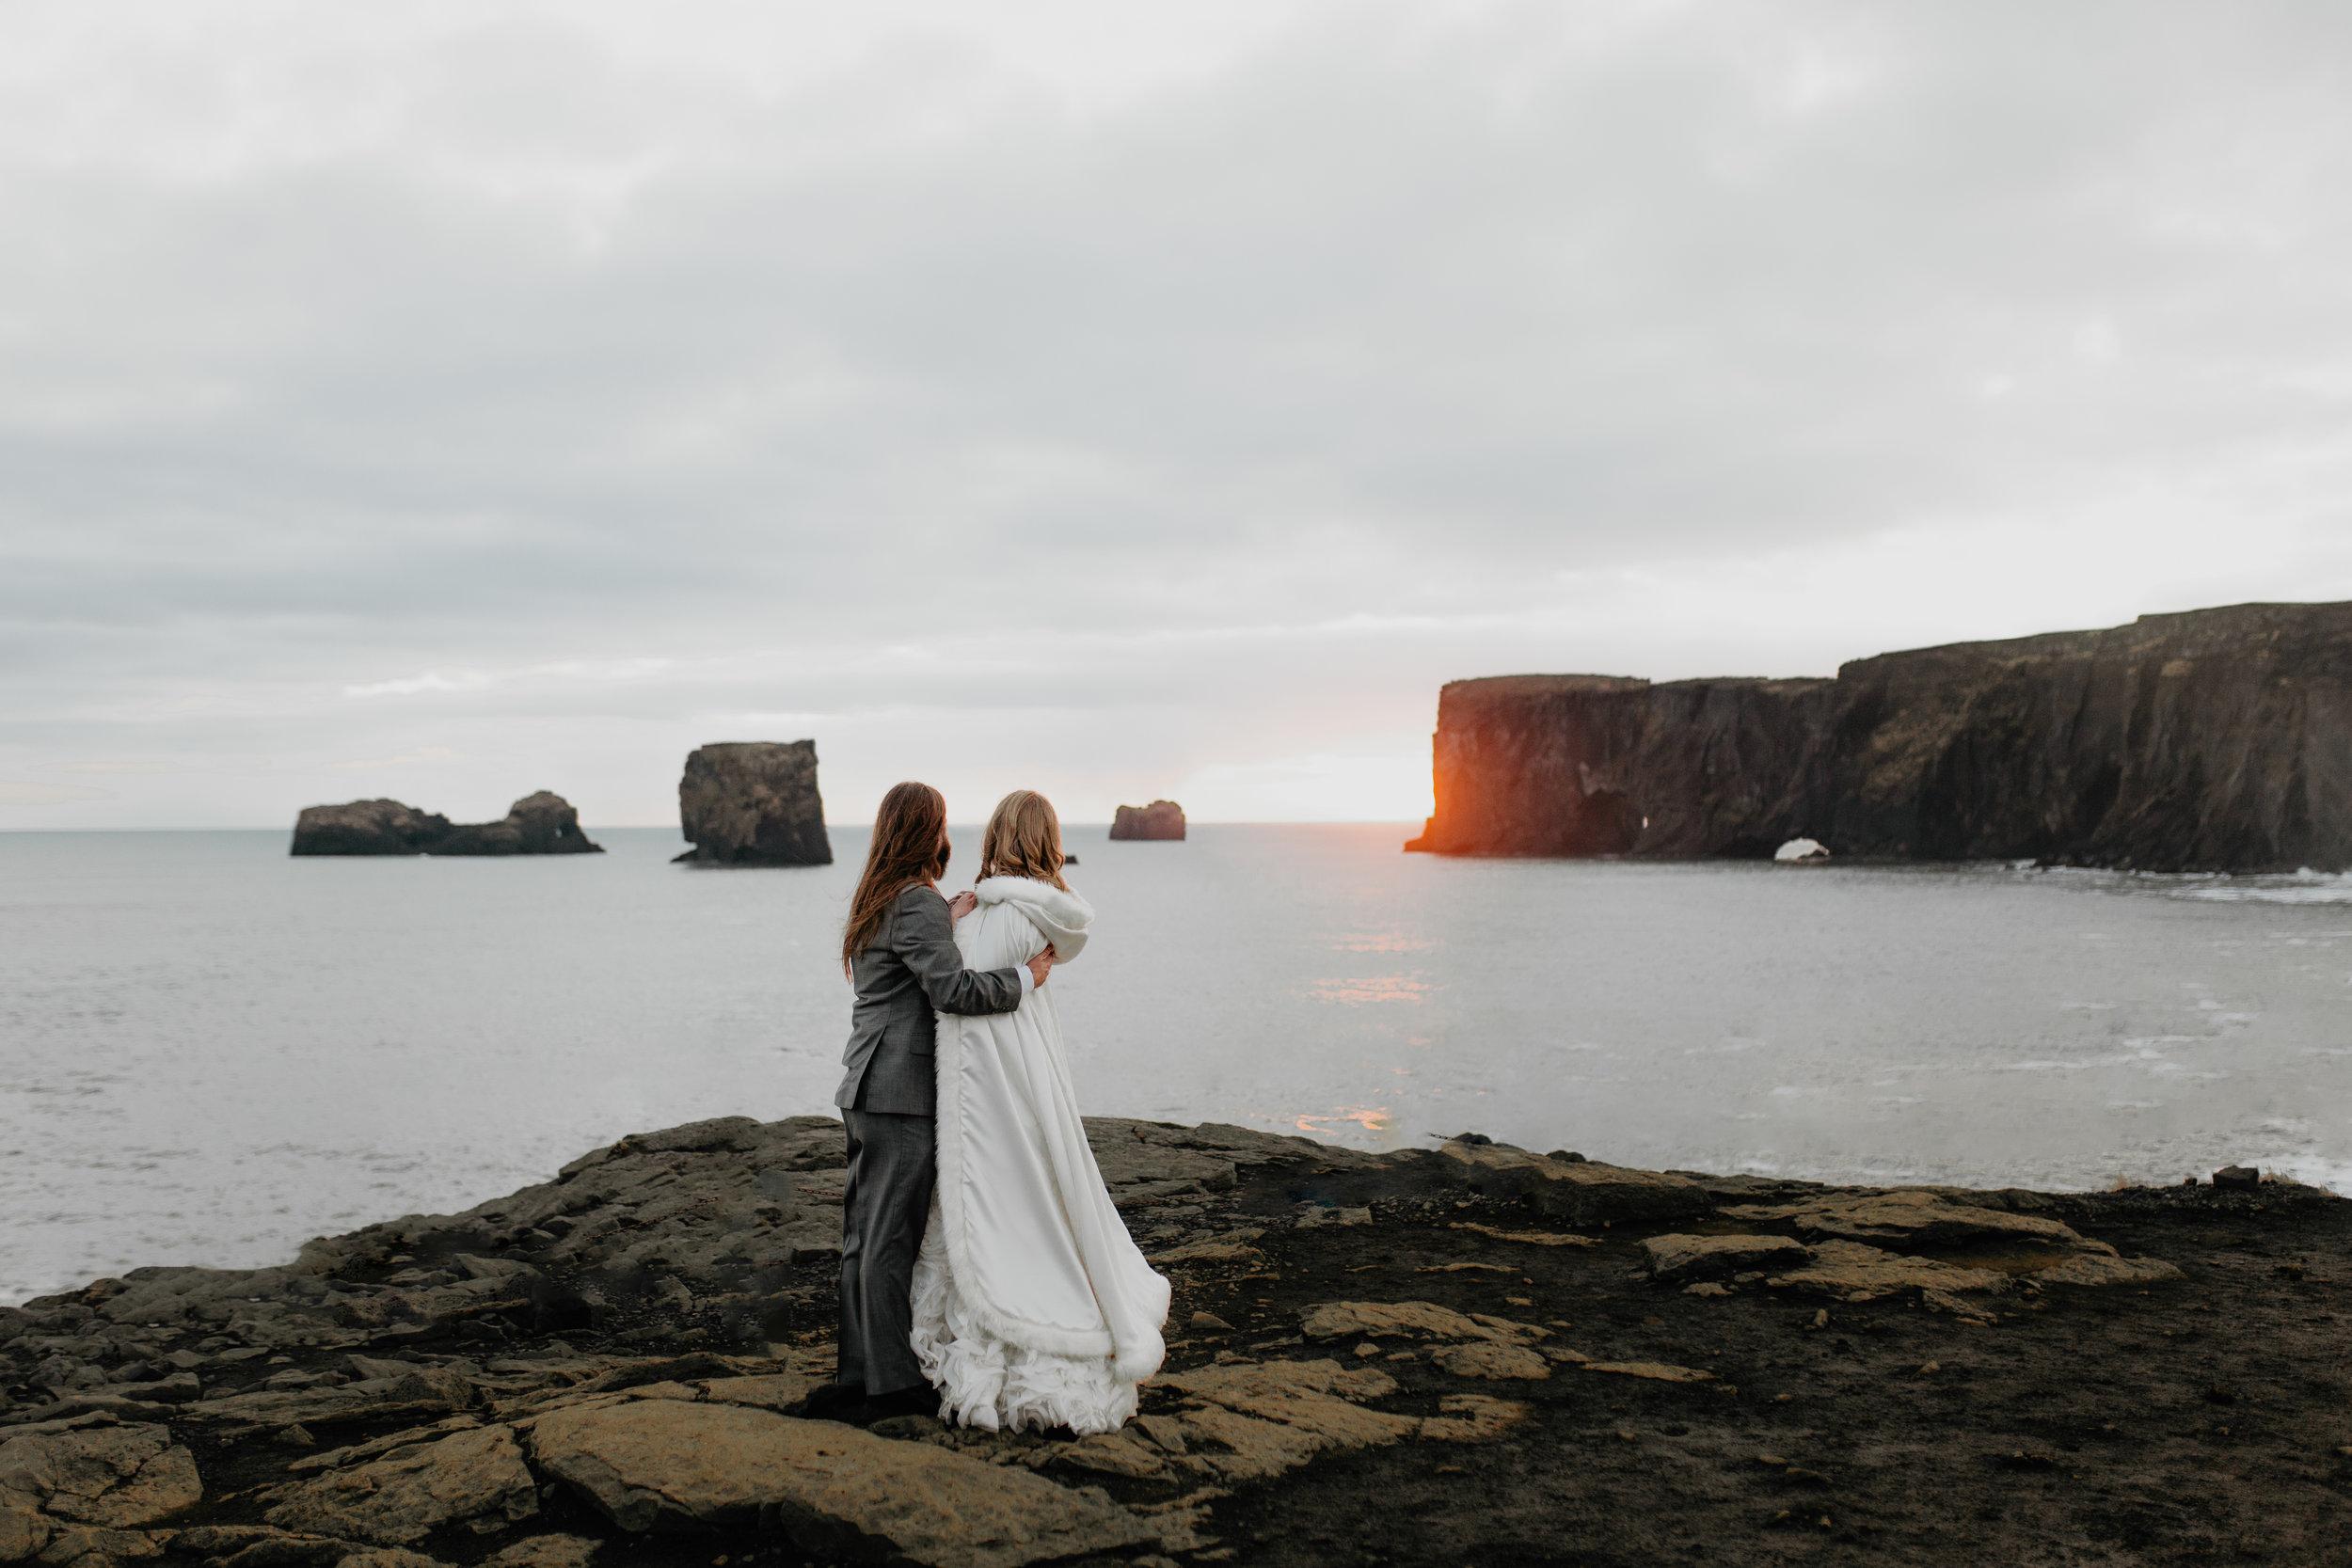 nicole-daacke-photography-iceland-winter-sunset-adventure-elopement-skogafoss-waterfall-black-sand-beach-dyrholaey-vik-iceland-intimate-wedding-black-church-elopement-photographer-55.jpg